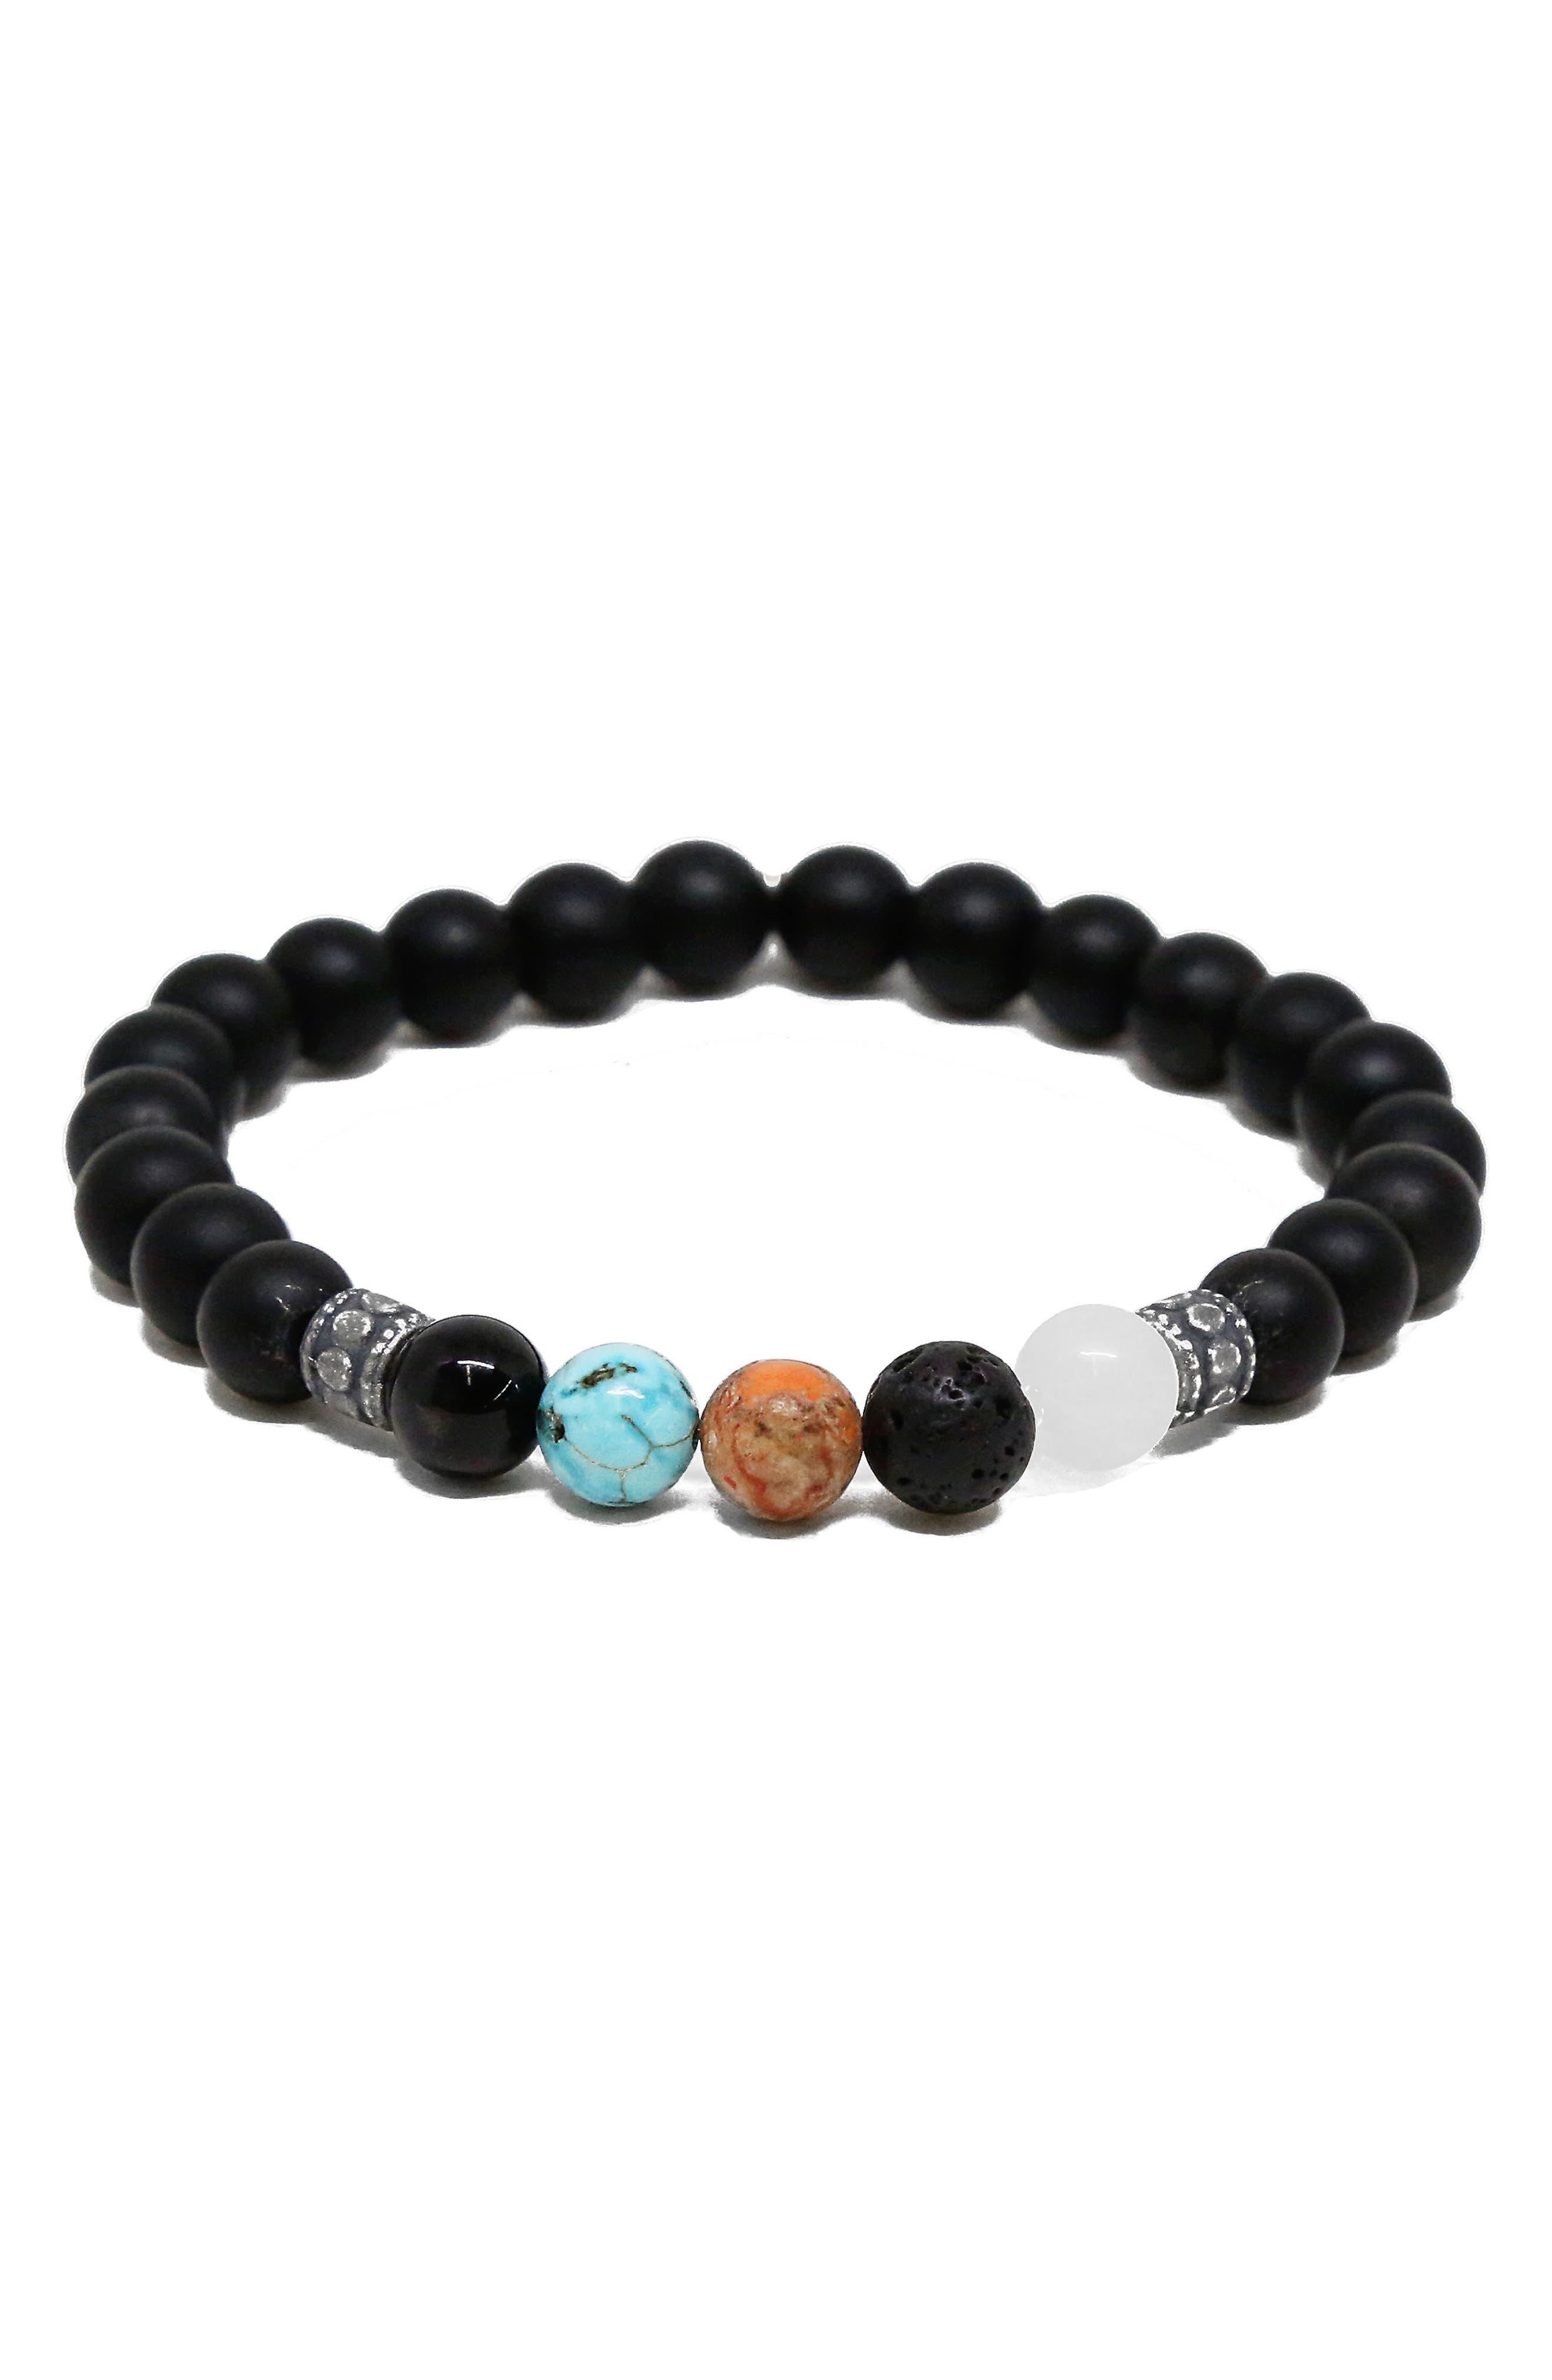 Stone Bead Bracelet,                             Main thumbnail 1, color,                             Black/ Agate